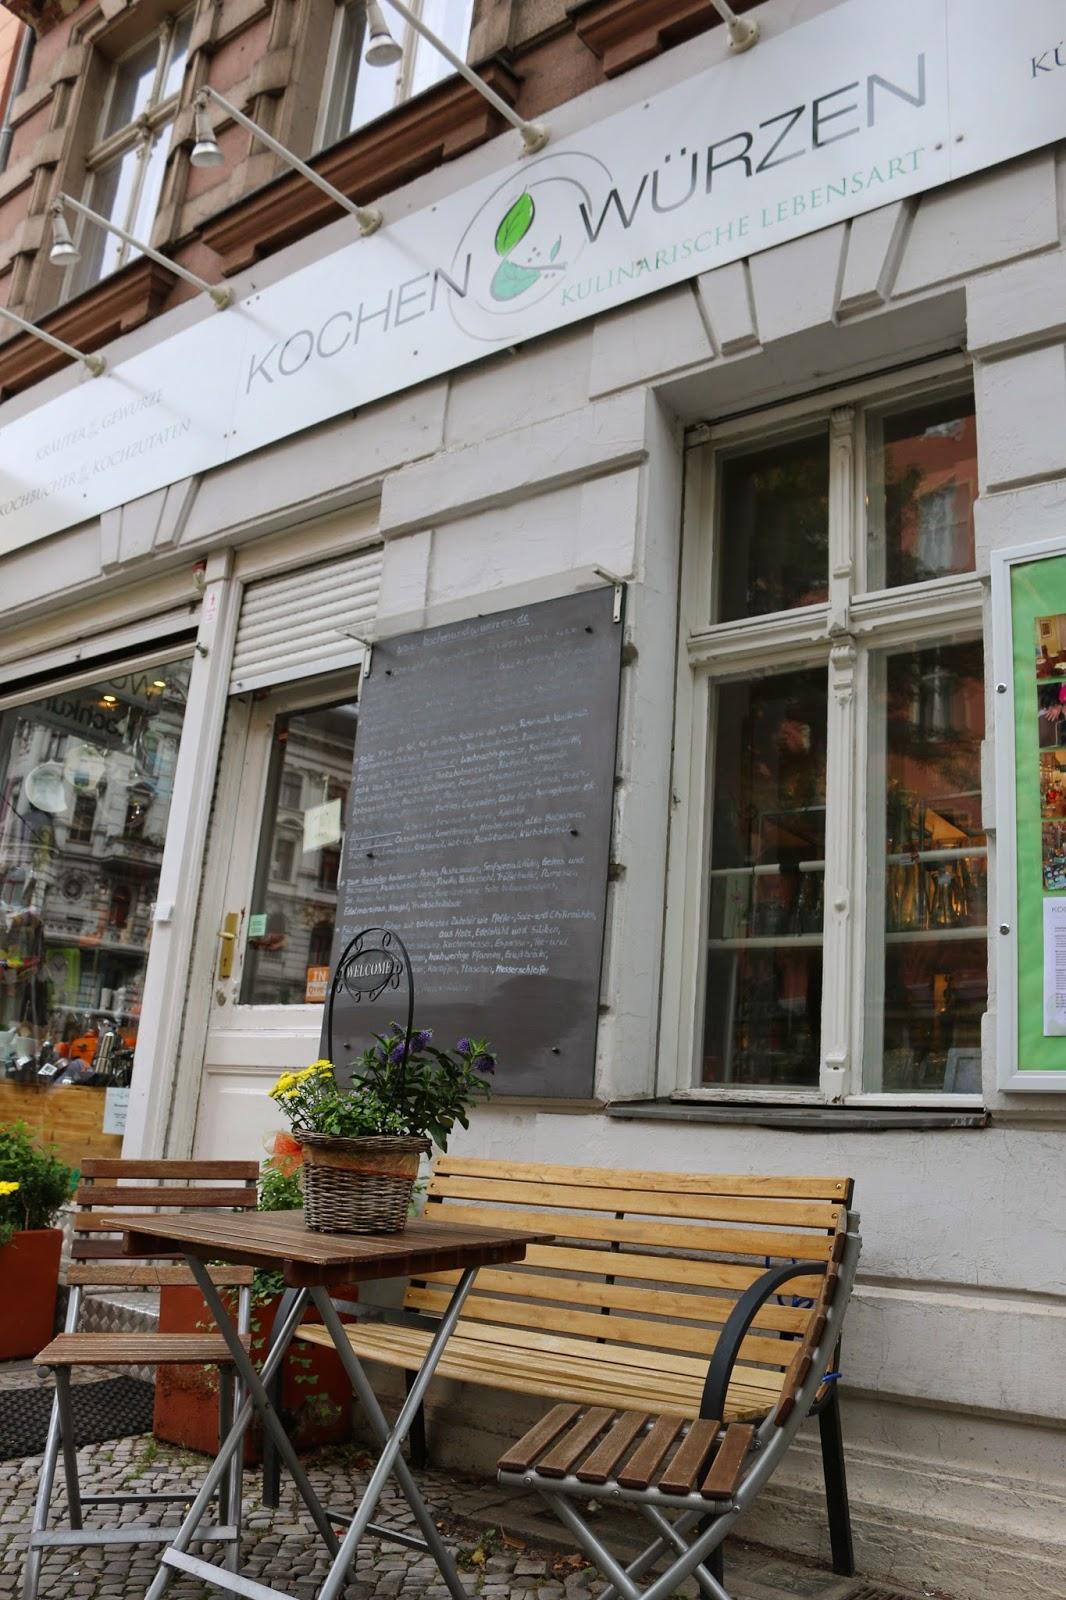 Berlin, Reisetipps, Städtereise, Tipps, Restaurants, Cafés, Shopping, Shops, Tourismus, Potsdam